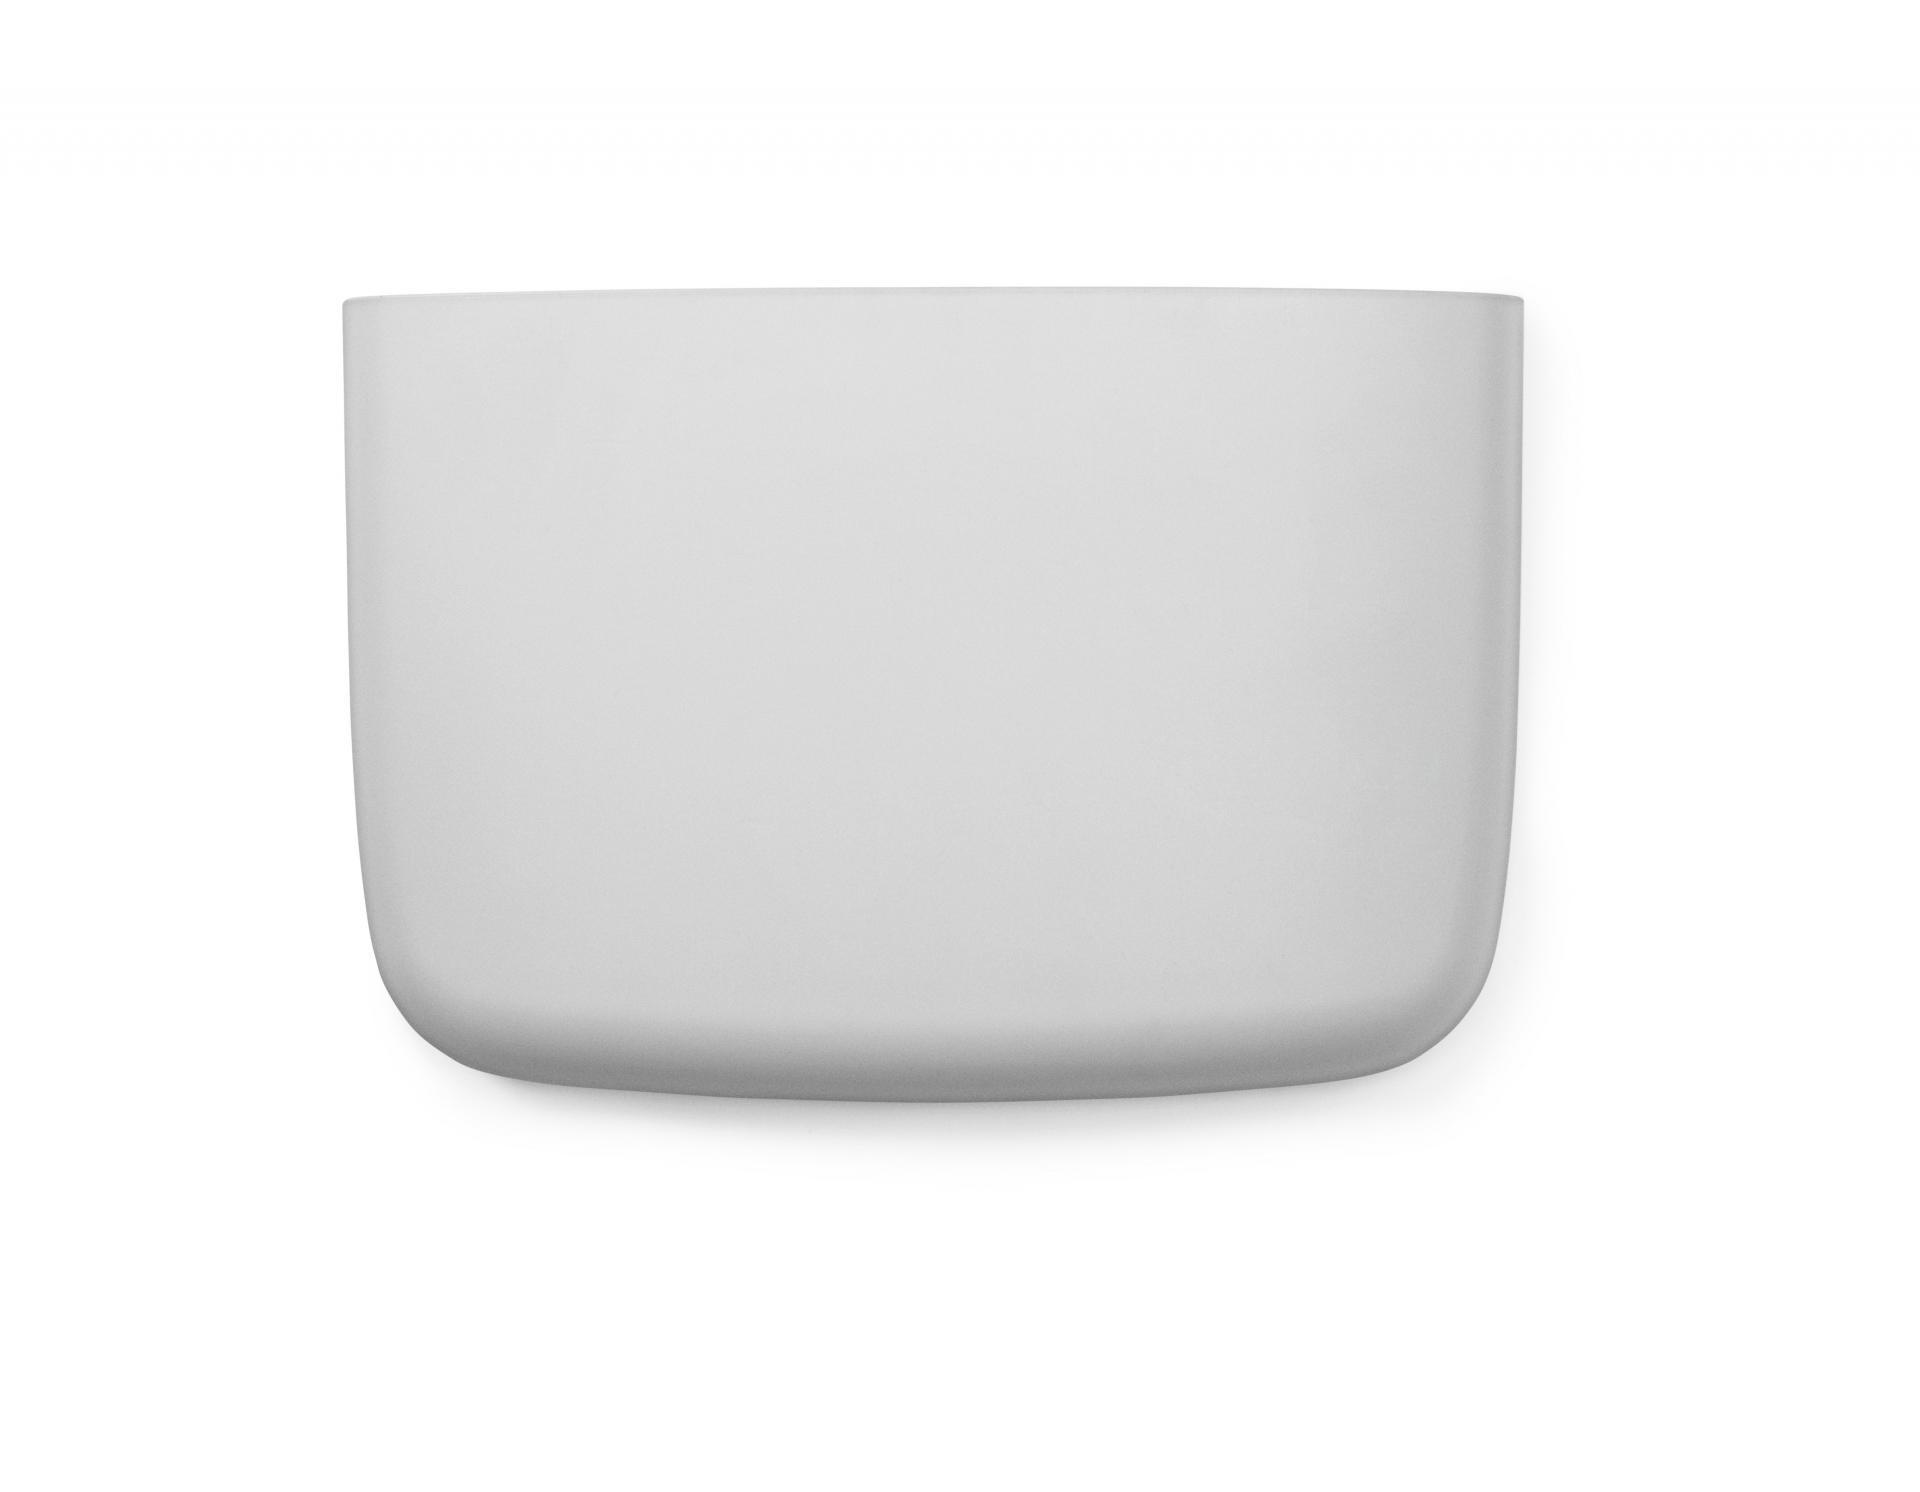 normann COPENHAGEN Nástěnný organizér Light Grey Pocket 4, šedá barva, plast